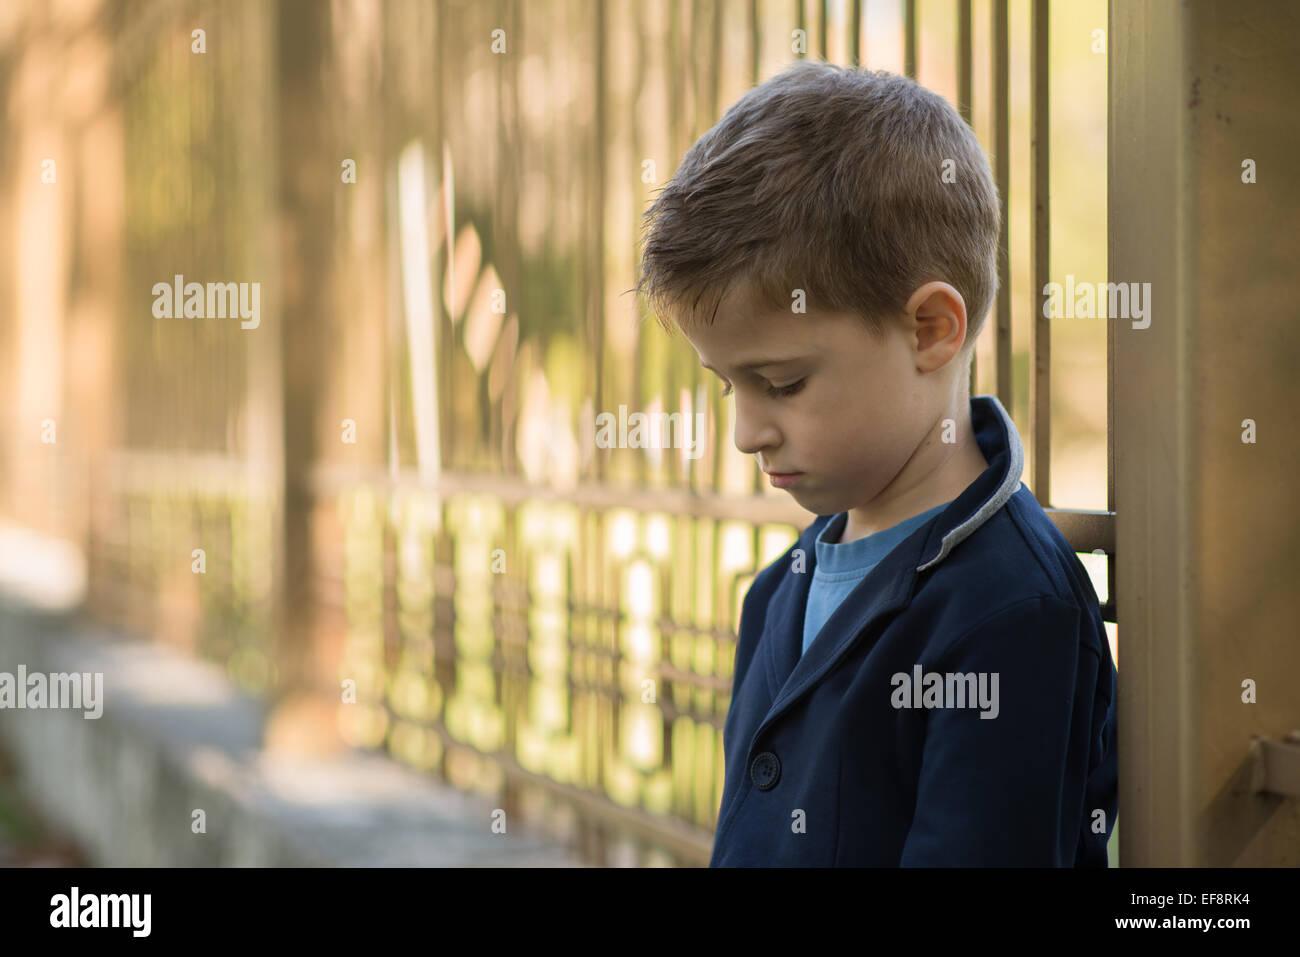 Portrait of a sad boy leaning against balustrades métalliques Photo Stock